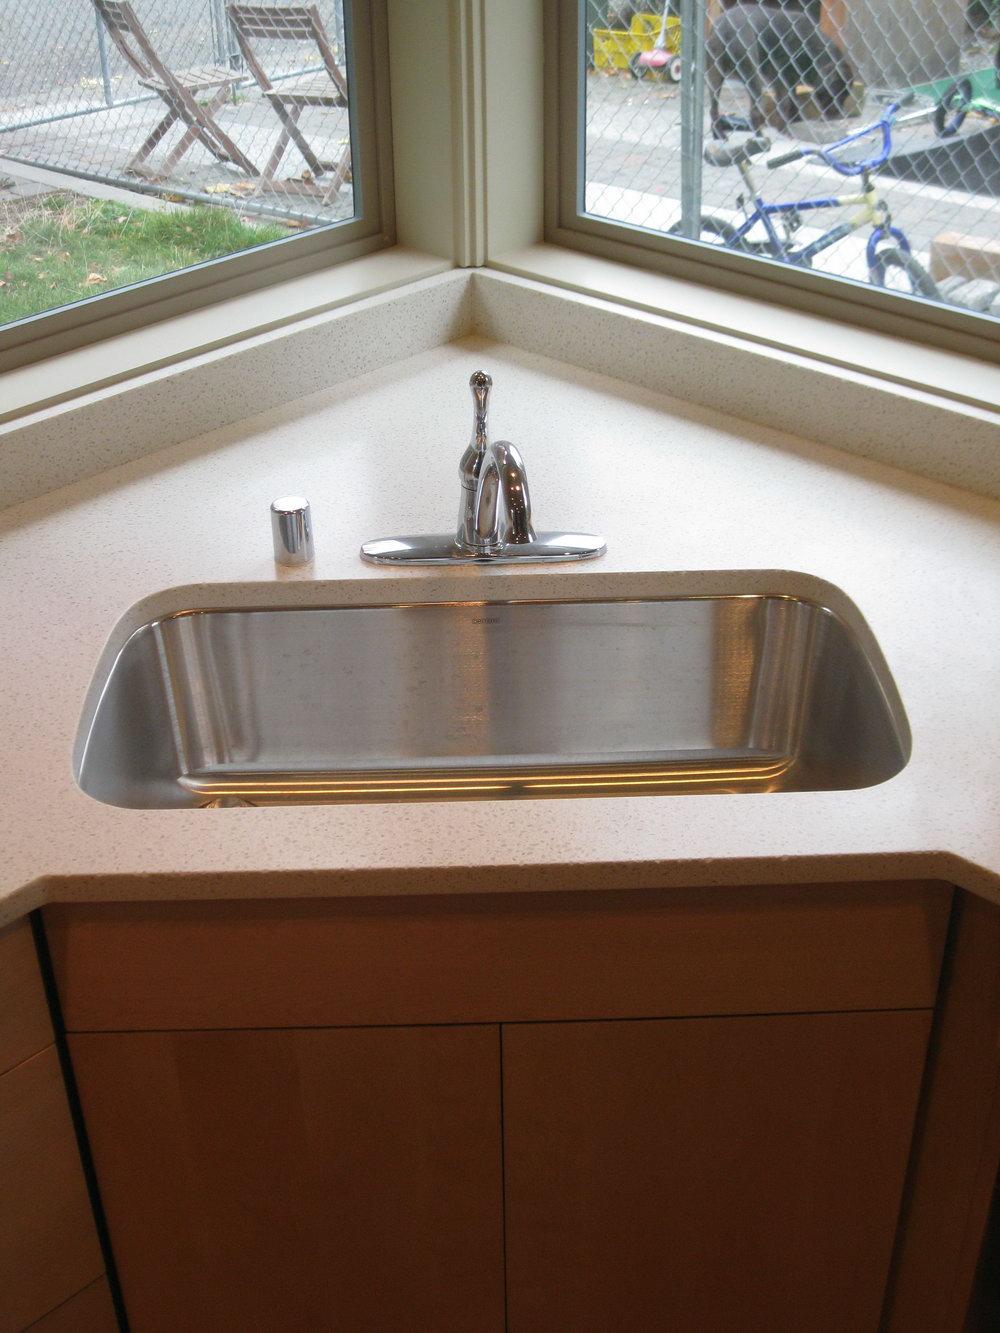 Kitchen Sink Cabinets Ikea